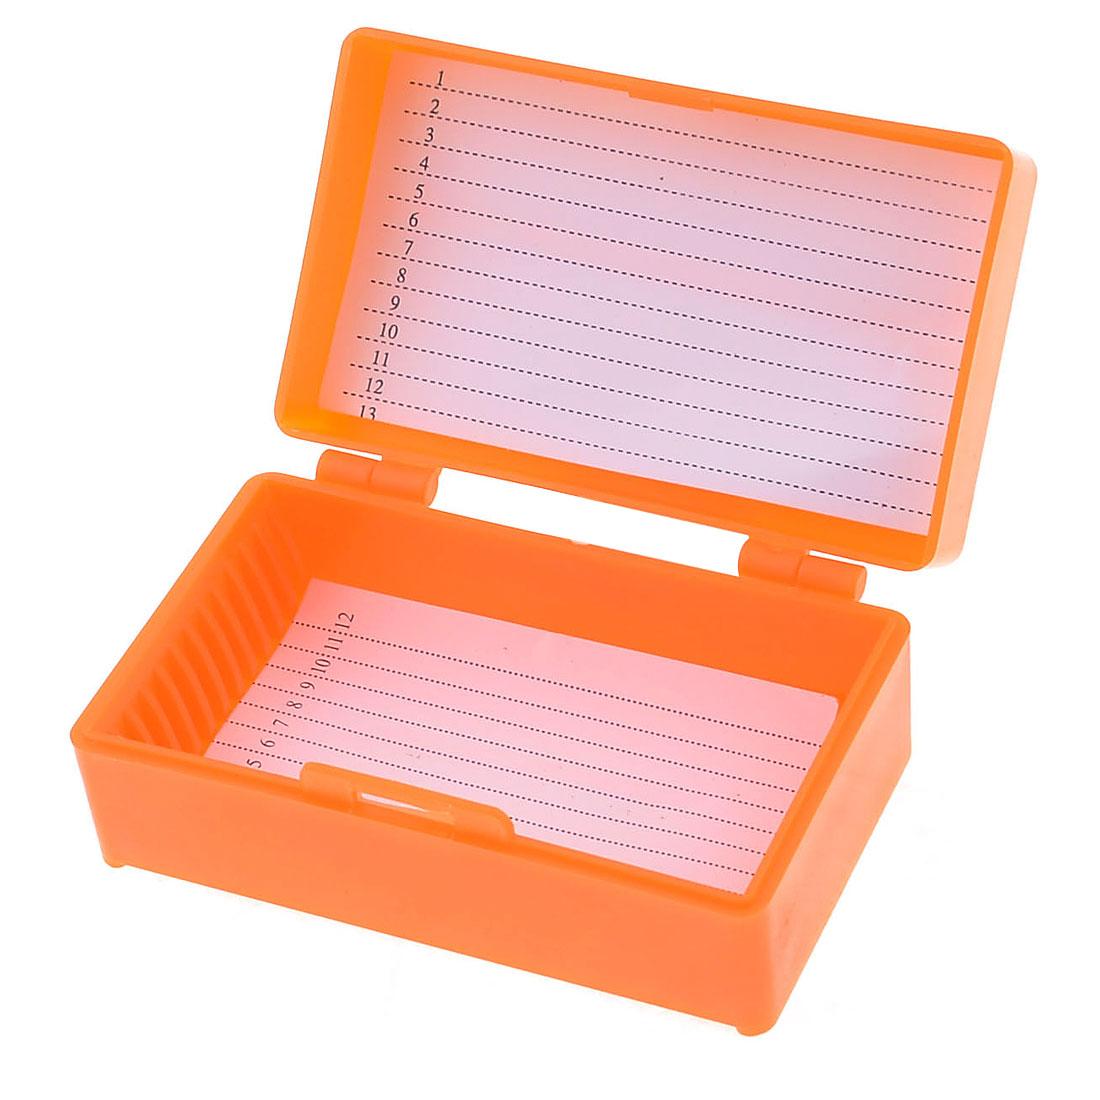 "Orange Plastic Rectangle Shape 12 Slides Microscope Box 3.1"" x 1.8"""